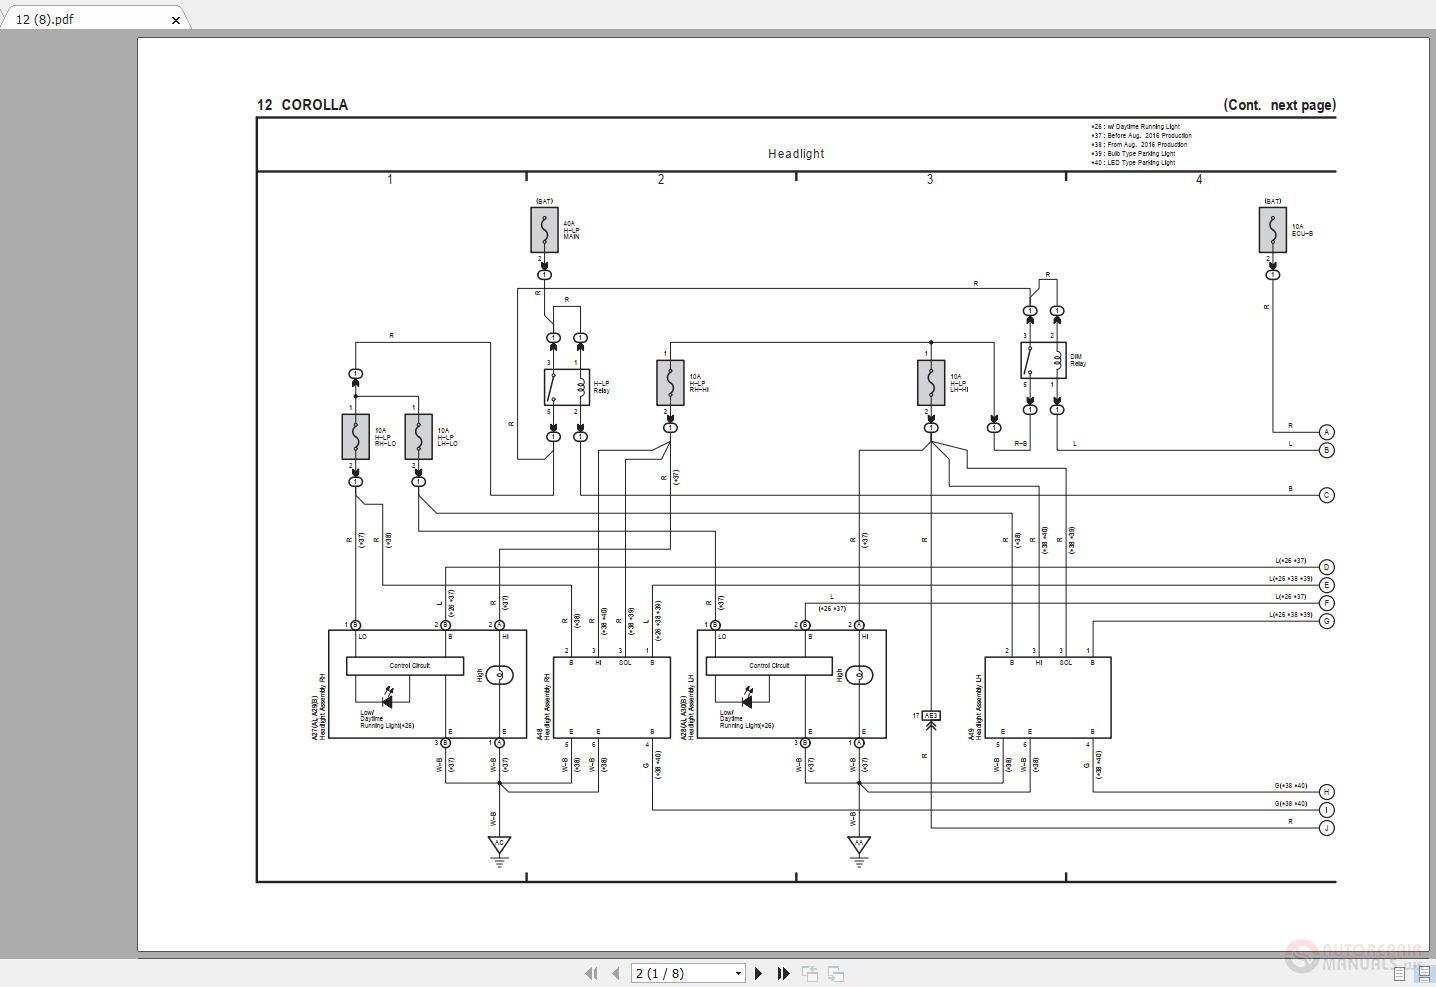 toyota corolla 2014-2019 electrical wiring diagram - auto repair  software-auto epc software-auto repair manual-workshop manual-service  manual-workshop manual  auto repair software-auto epc software-auto repair manual-workshop  manual-service manual-workshop manual